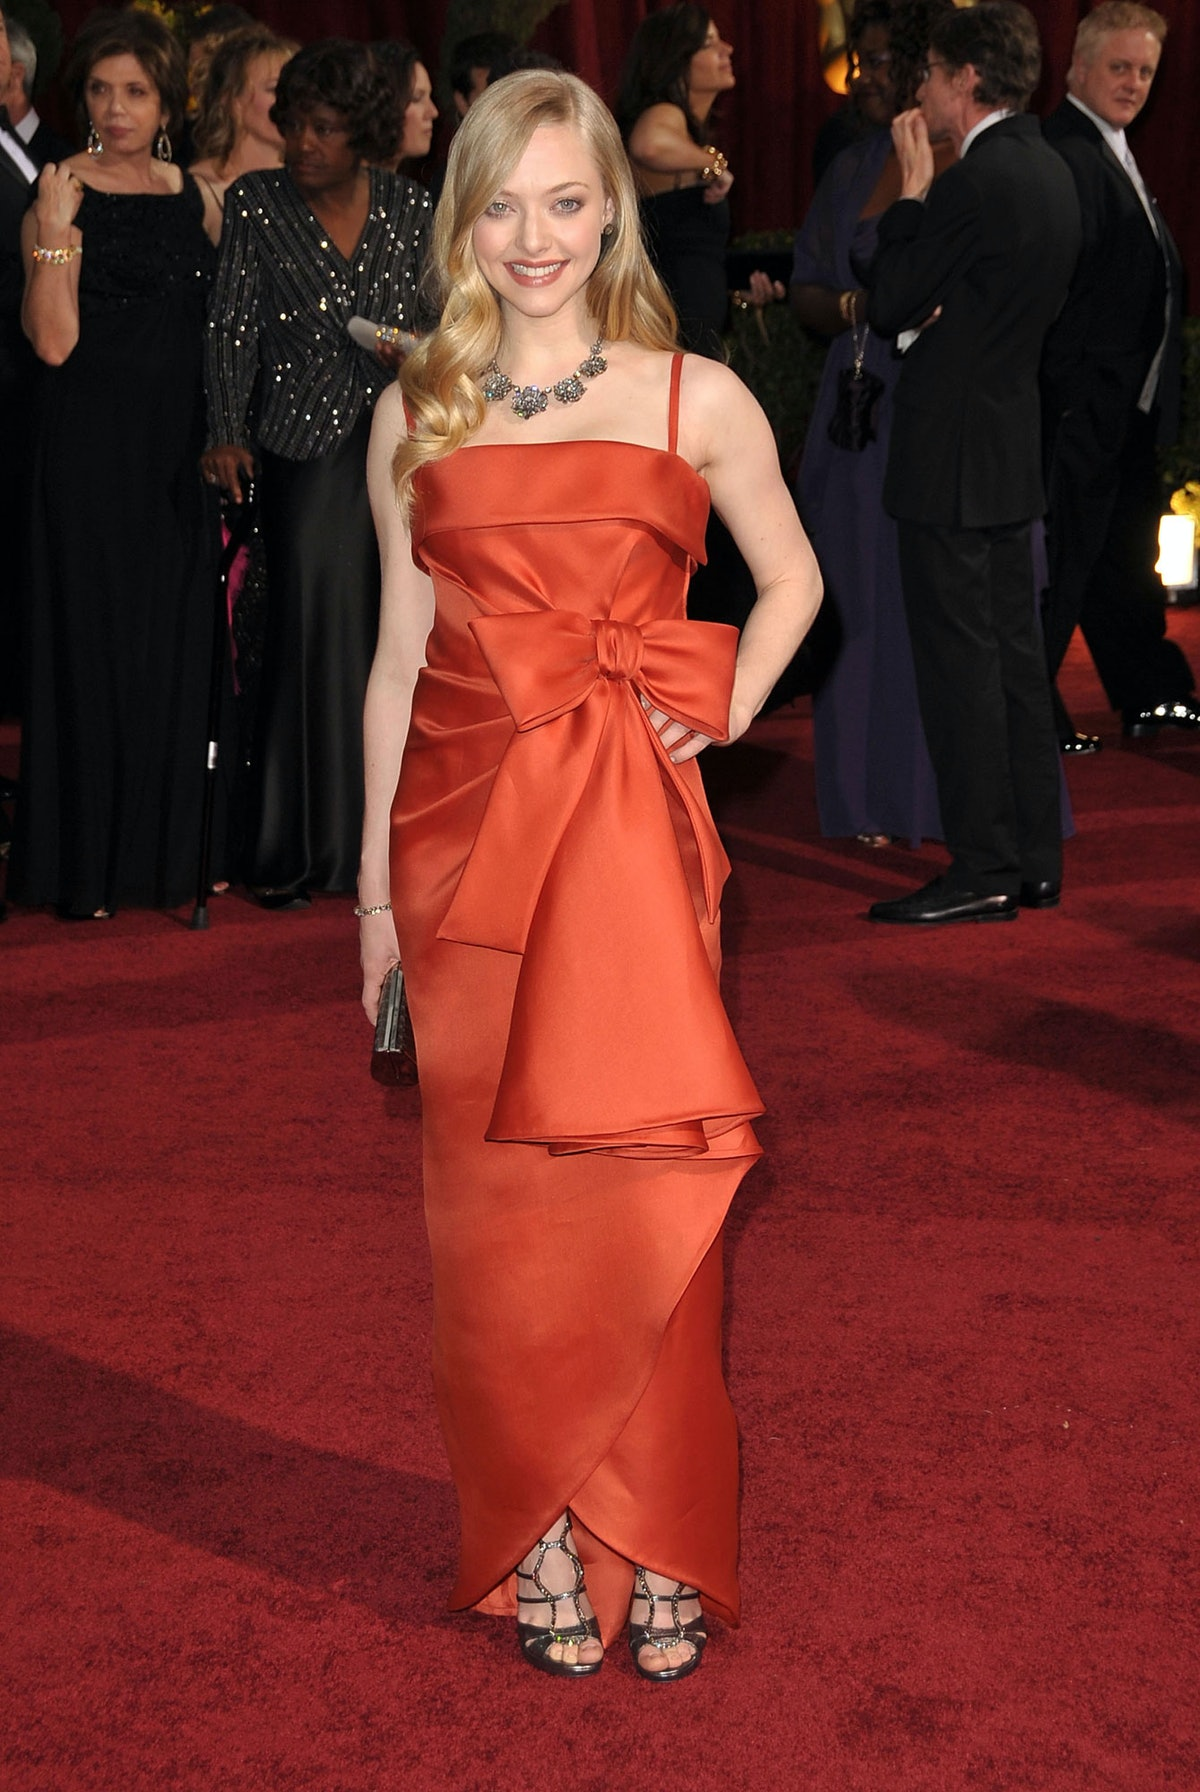 Amanda Seyfried 2009 Oscars